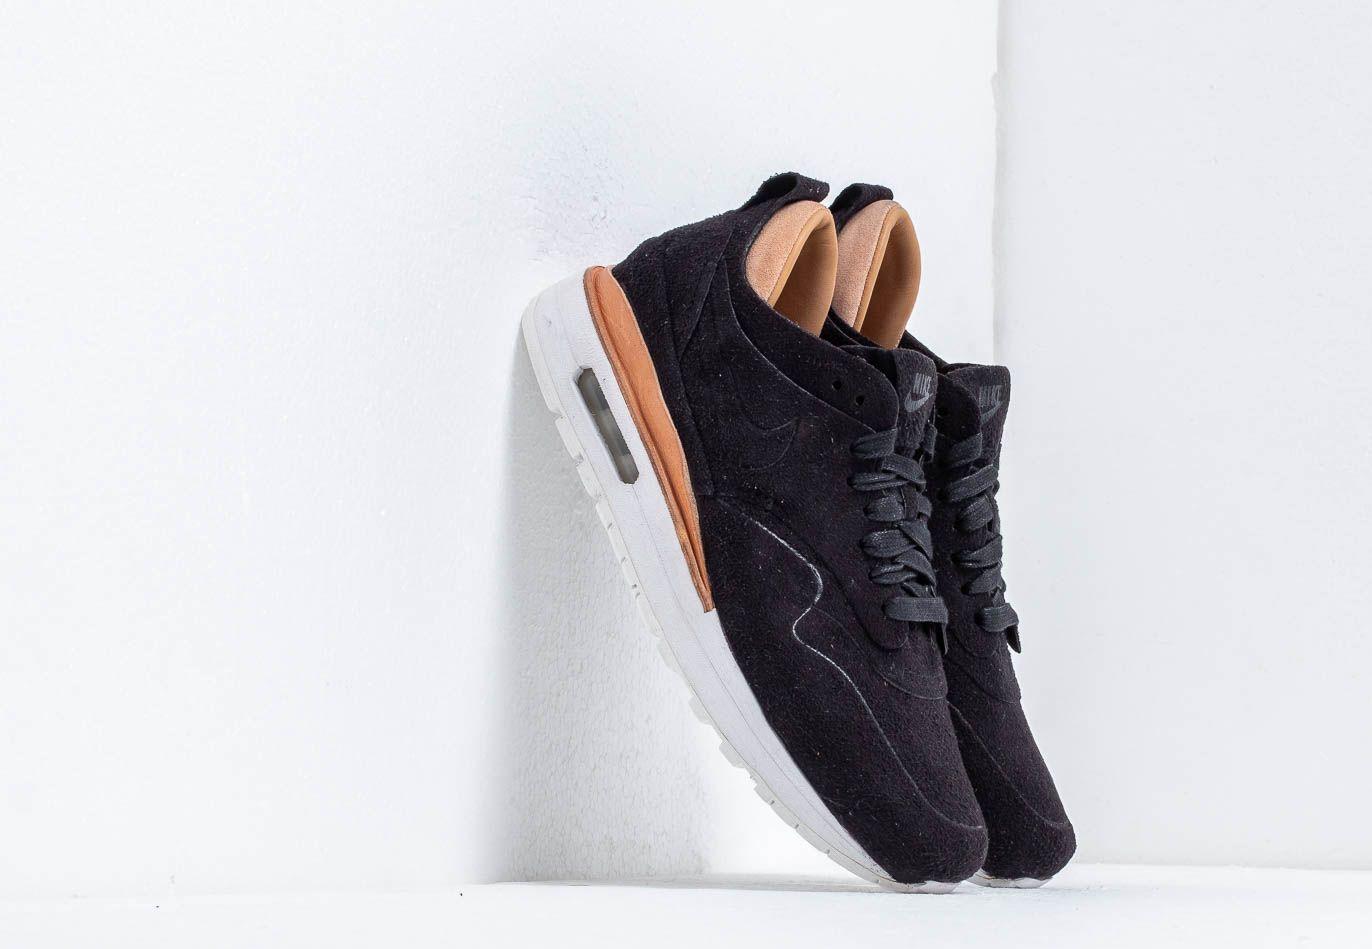 Nike Wmns Air Max 1 Royal Black/ Black EUR 41